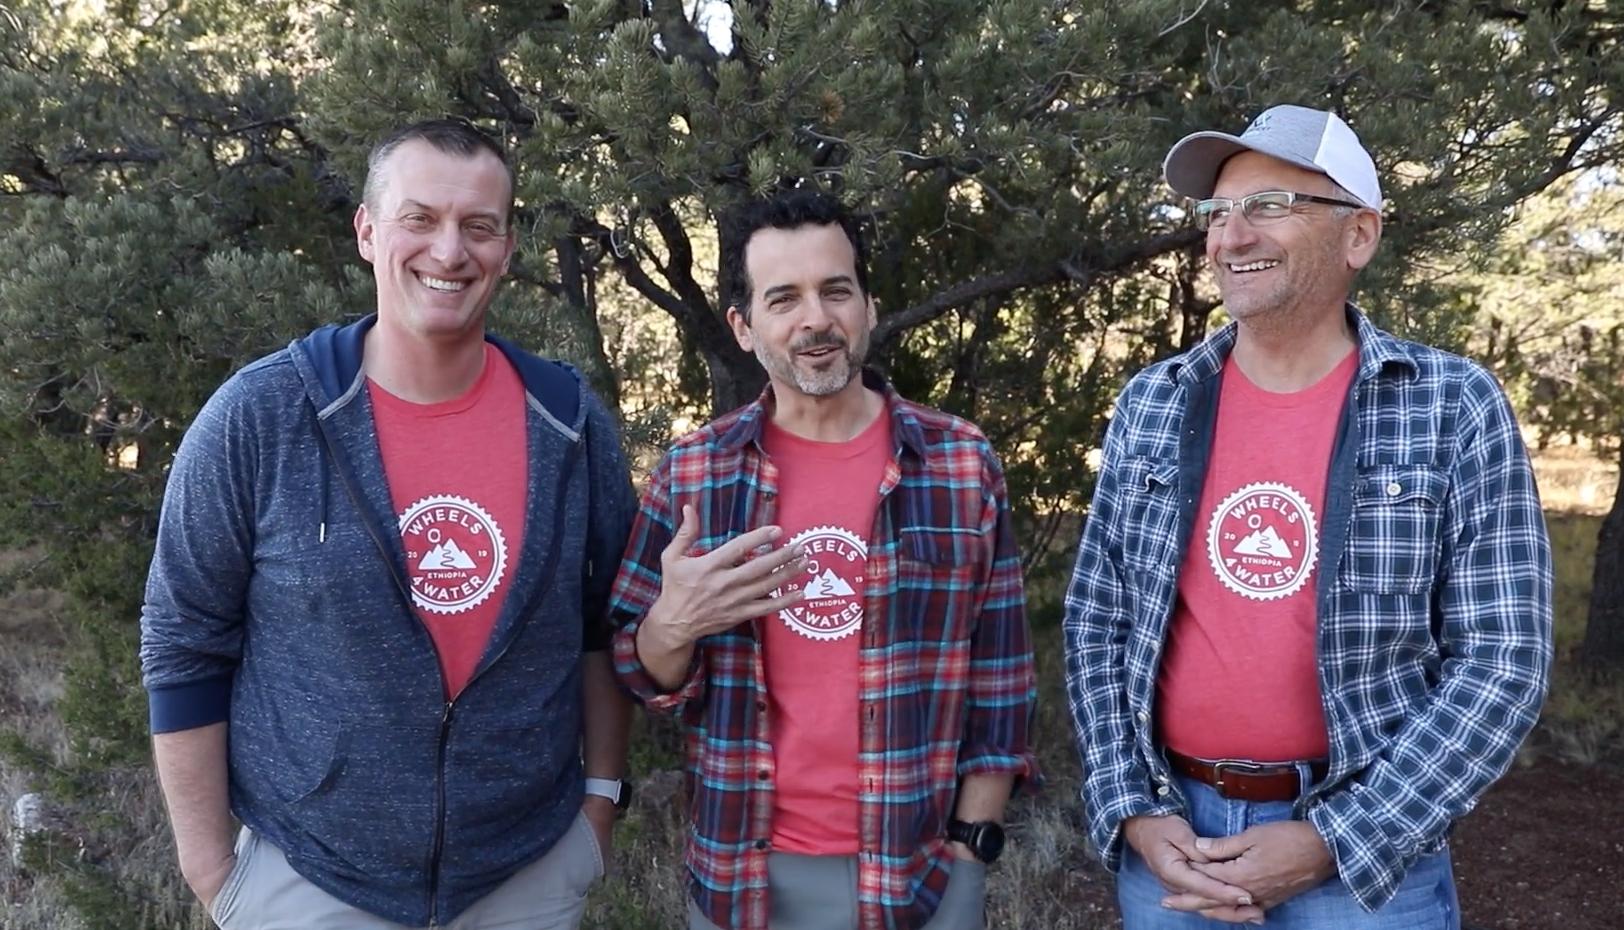 Justin Ahrens, Brian MacDonald and Tony Narducci announce 2019 Wheels4Water.